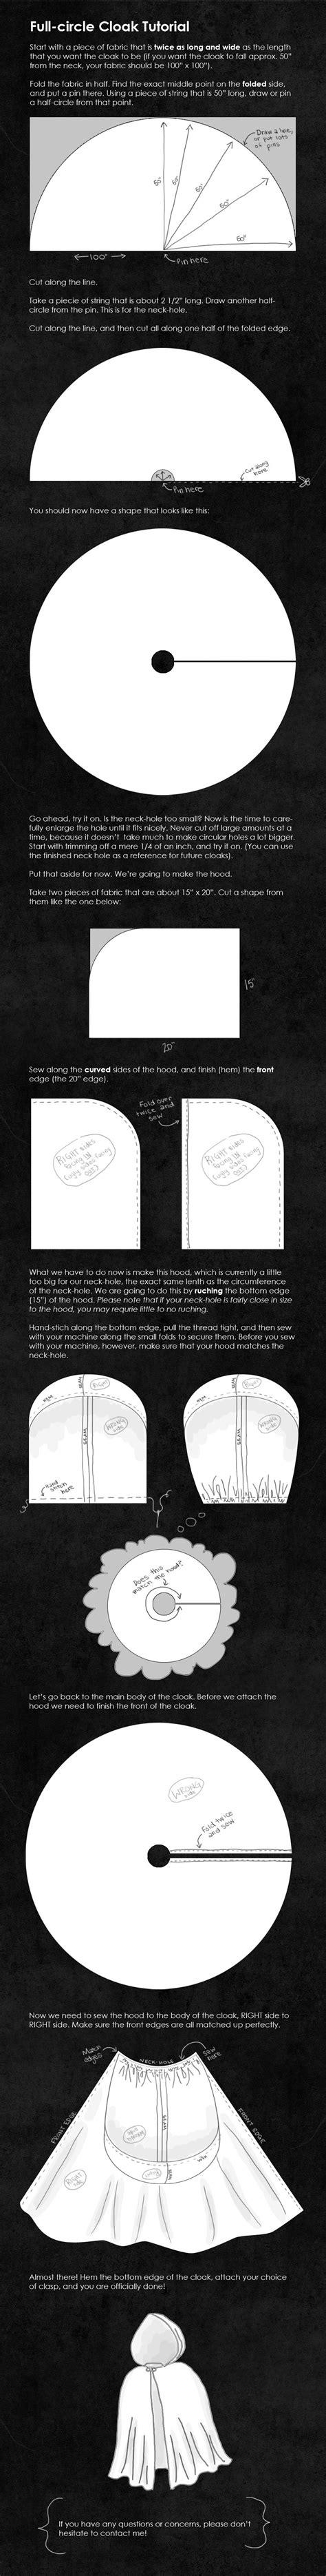 typography tutorial deviantart full circle cloak tutorial by ti design deviantart com on